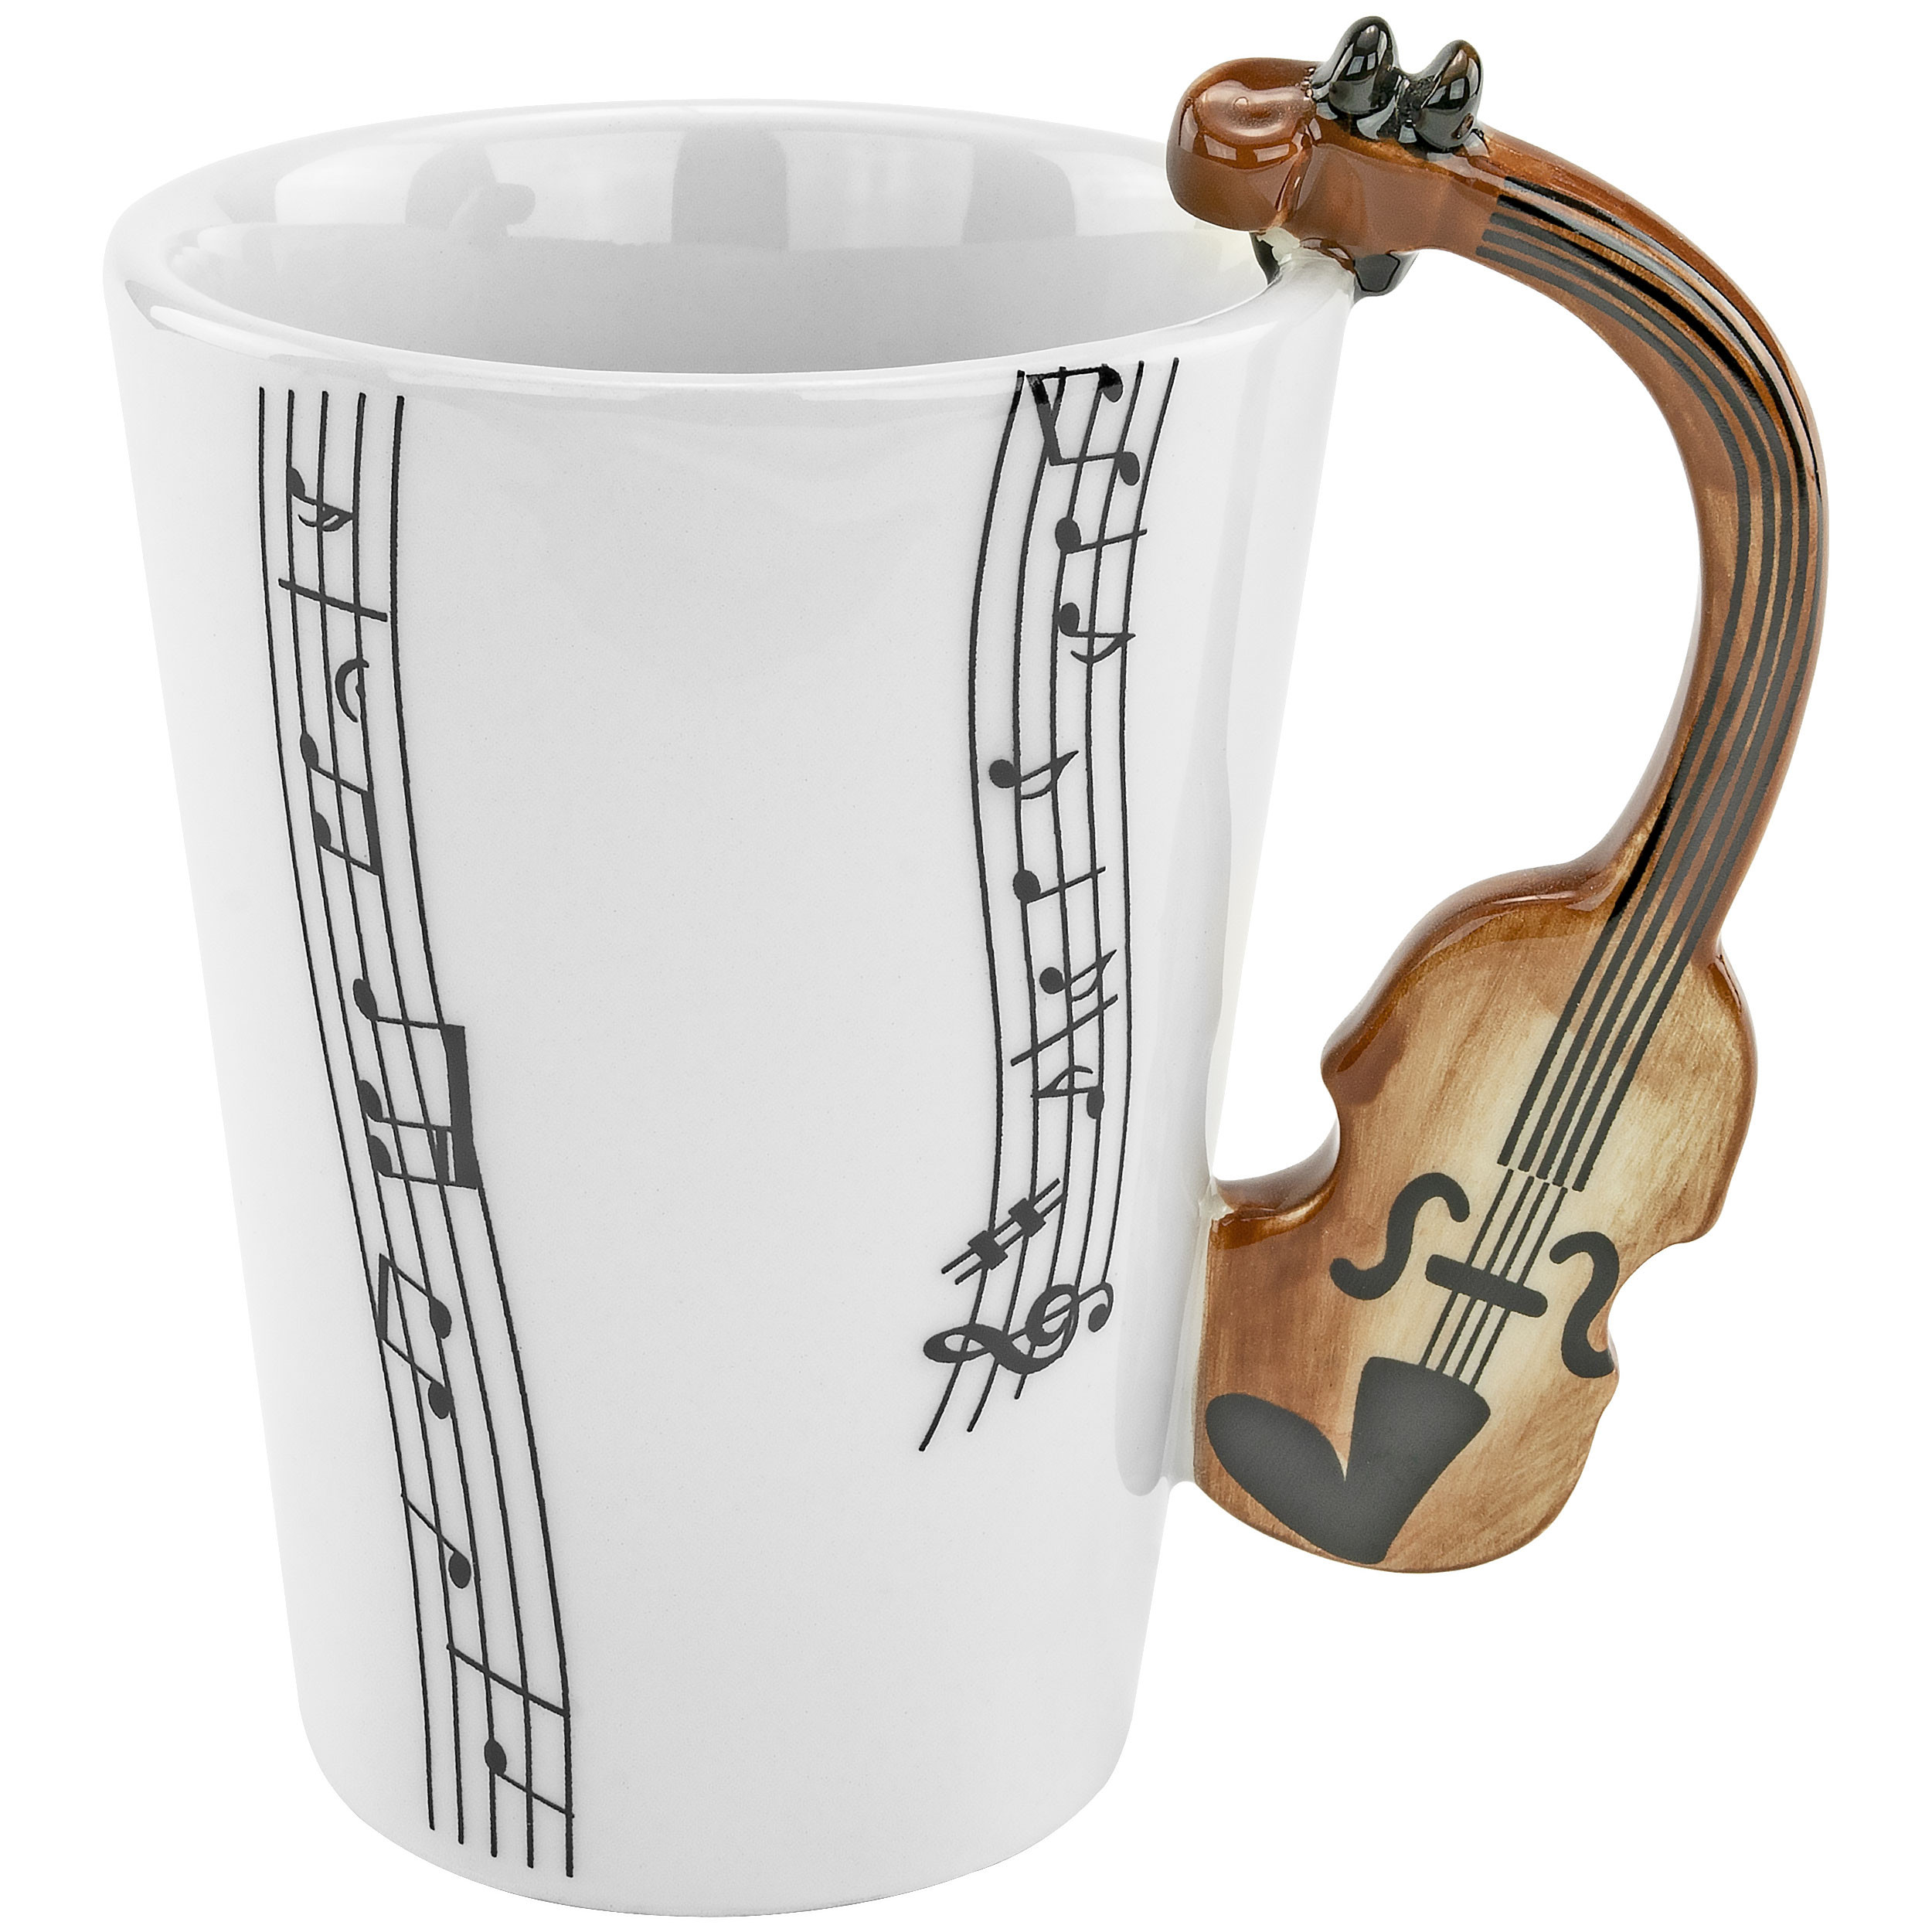 Fairly Odd Novelties FON-10213 Violin Ceramic 8oz Coffee Mug Perfect Musician Orchestra Novelty Gift/Present, One Size, White